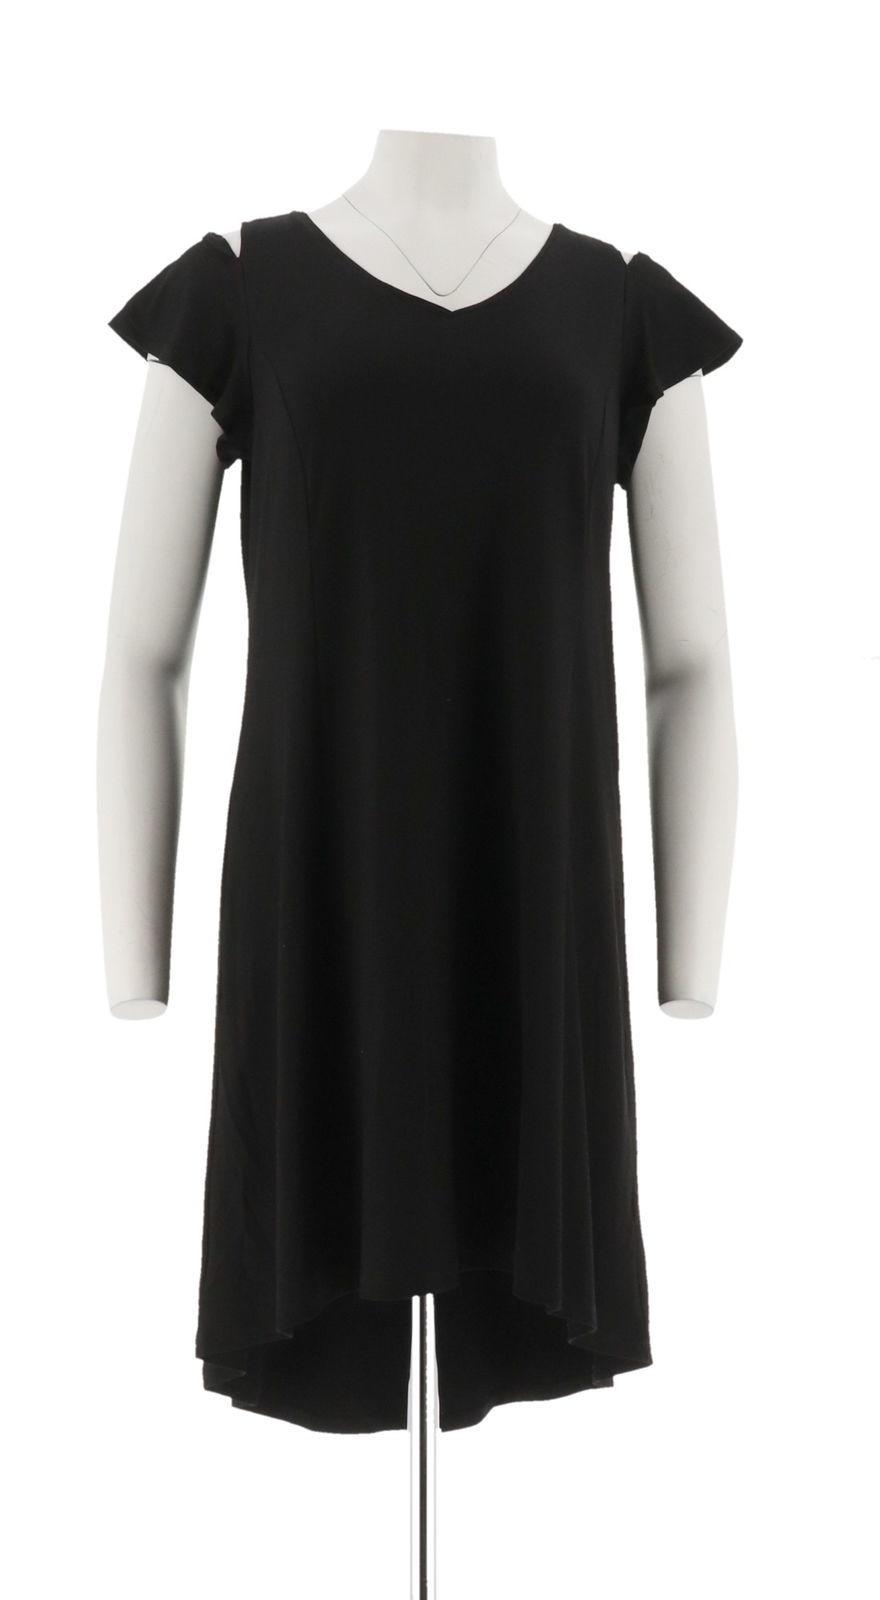 H Halston Petite Knit Crepe Dress Cutout Black PS NEW A308103